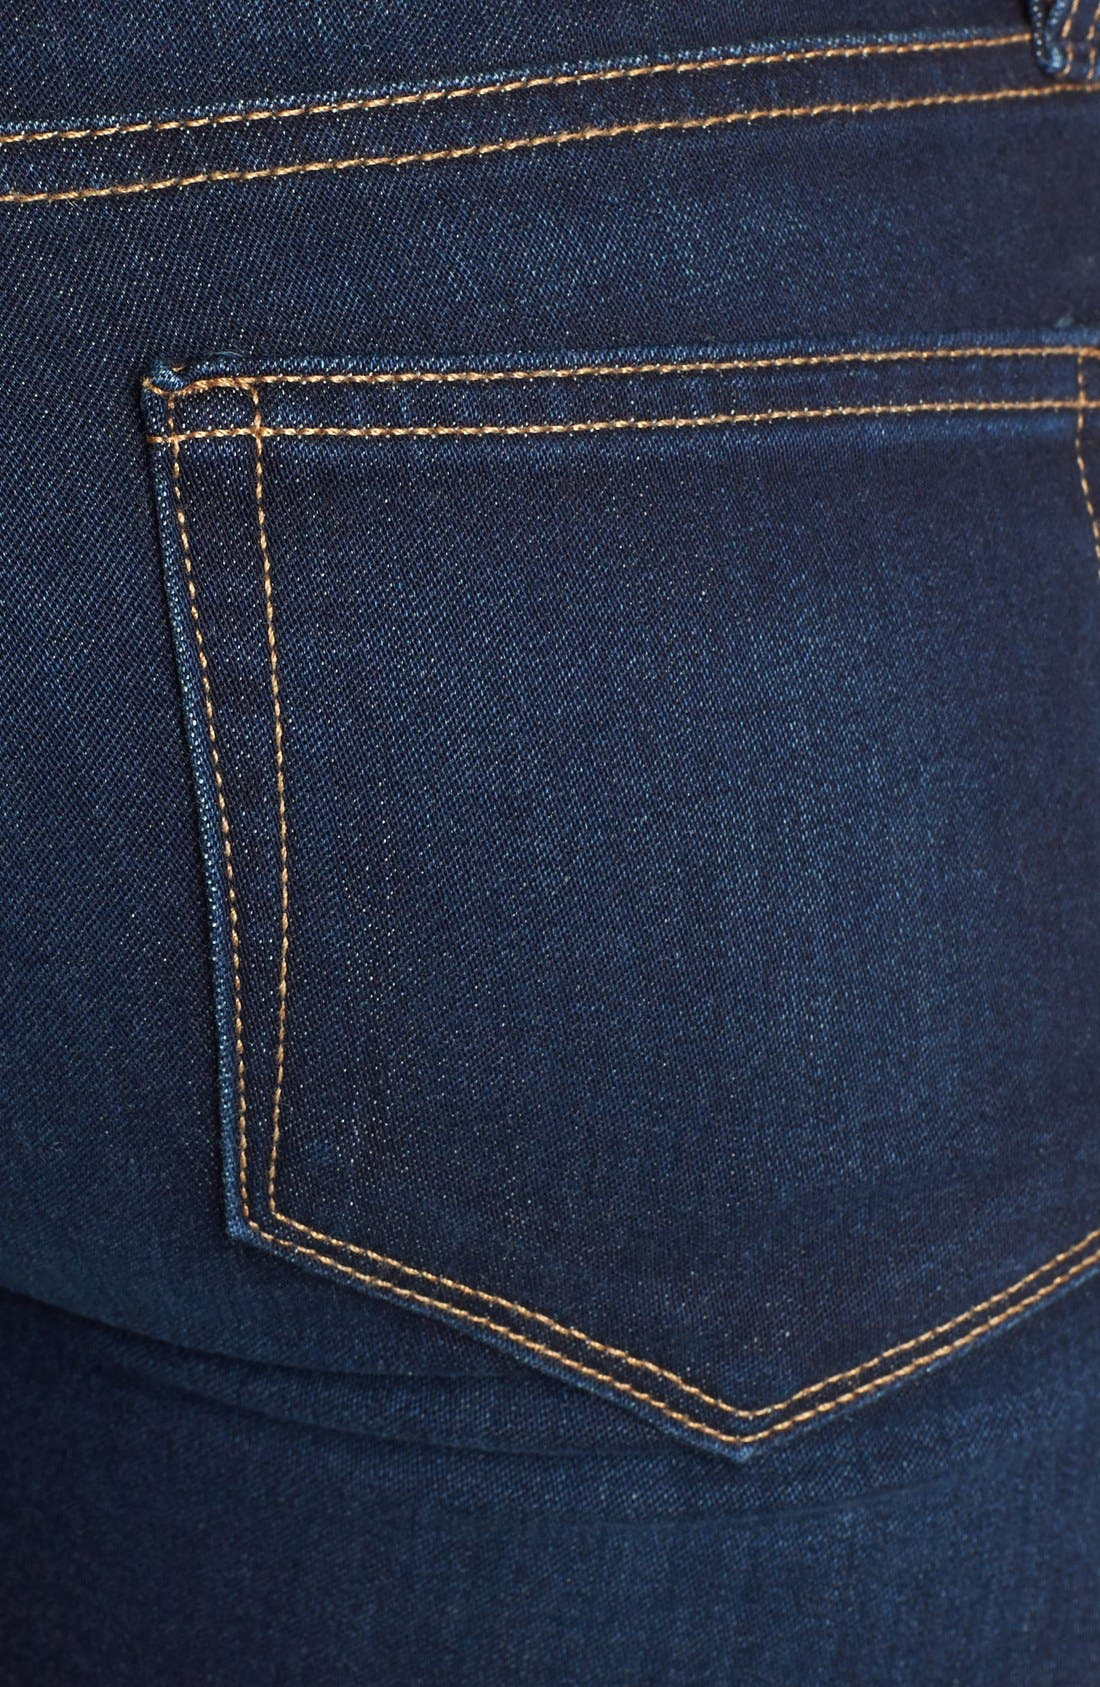 Alternate Image 3  - Paige Denim 'Manhattan' Bootcut Jeans (Surface)